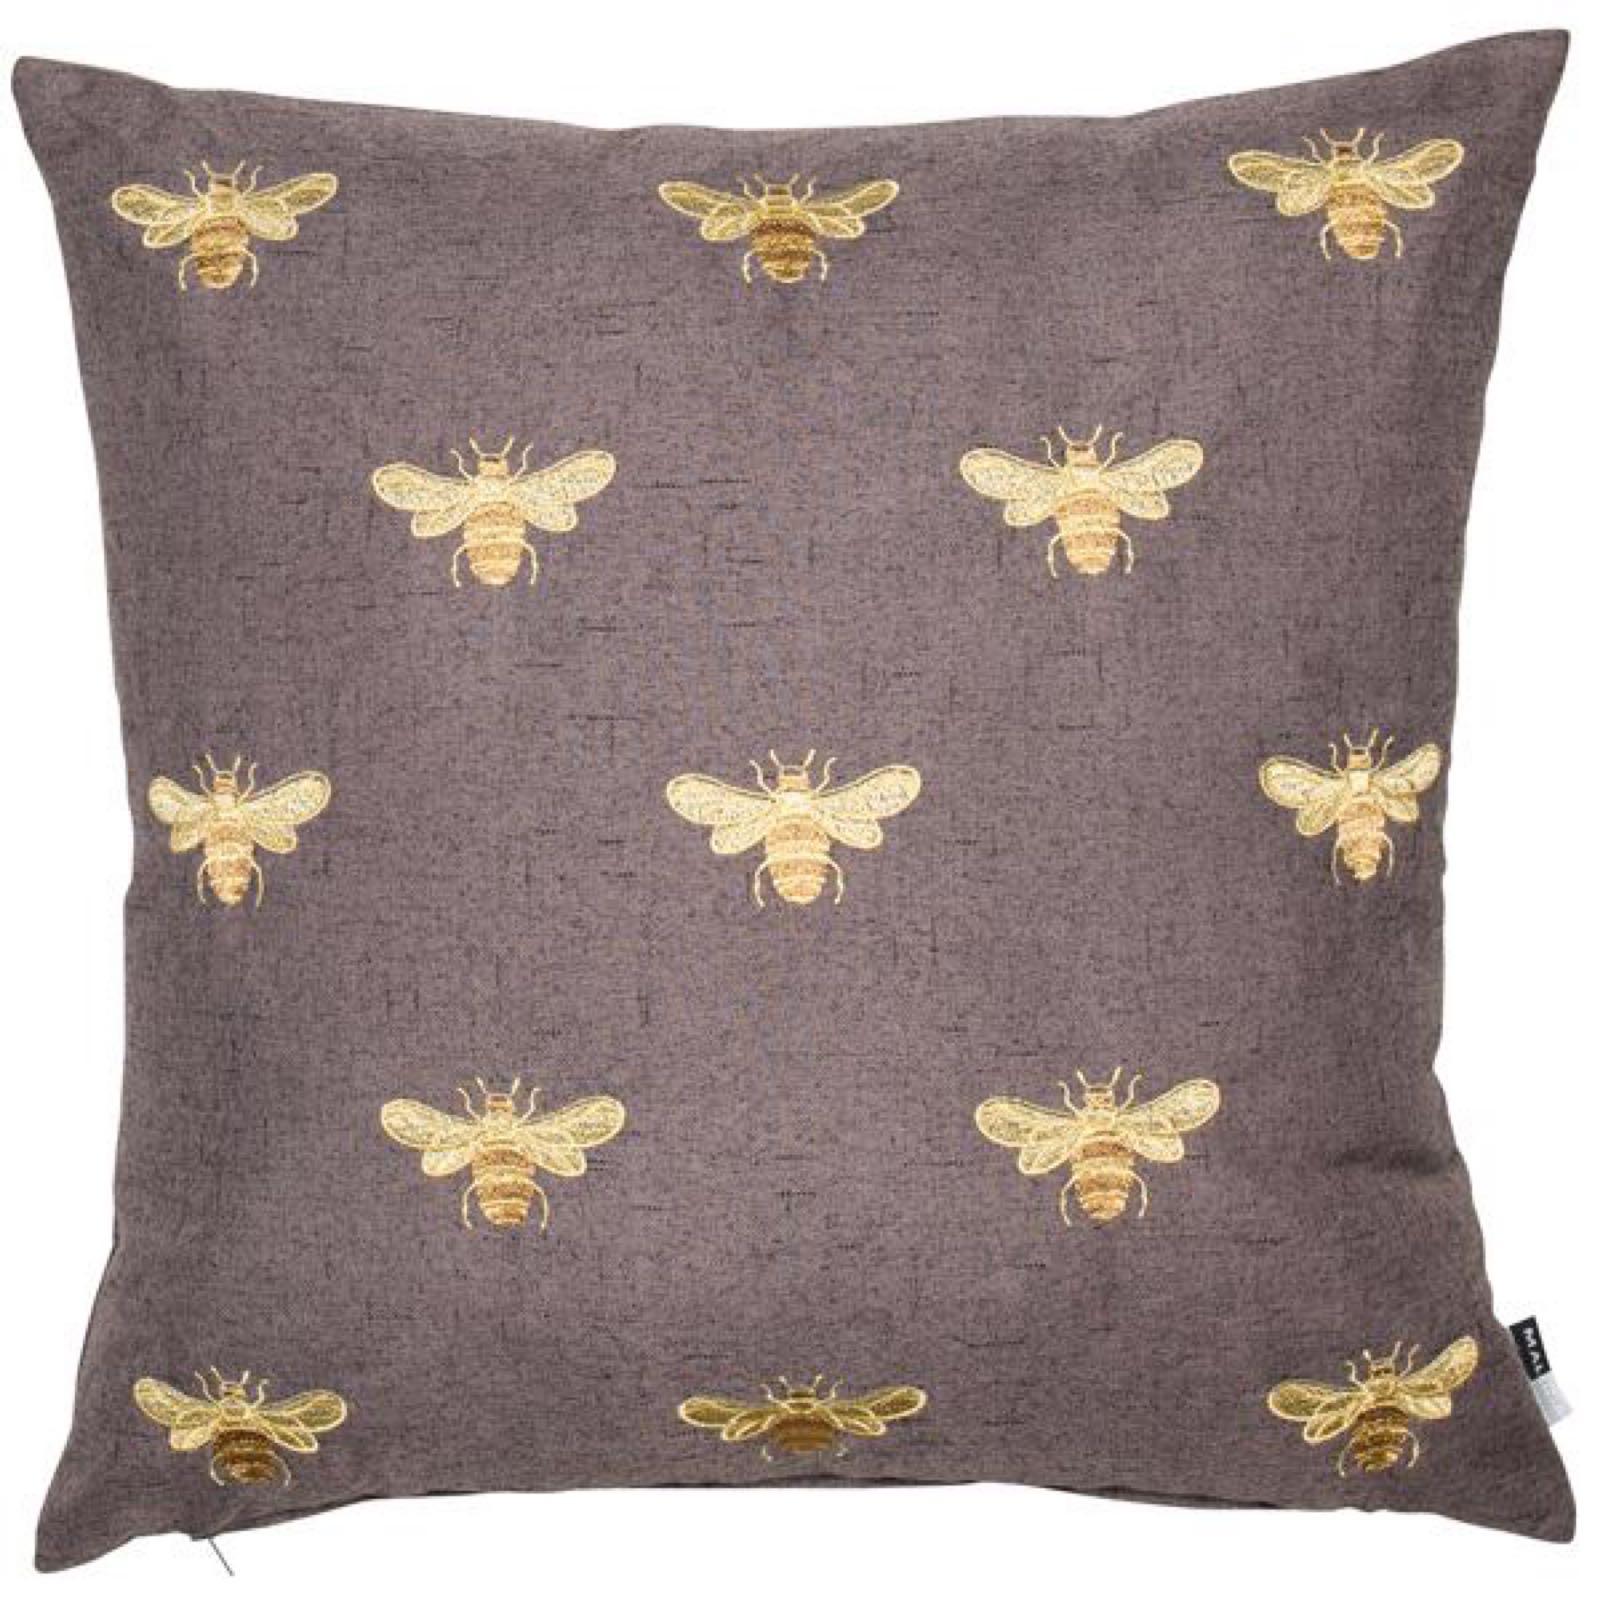 Bee Cushion - Truffle